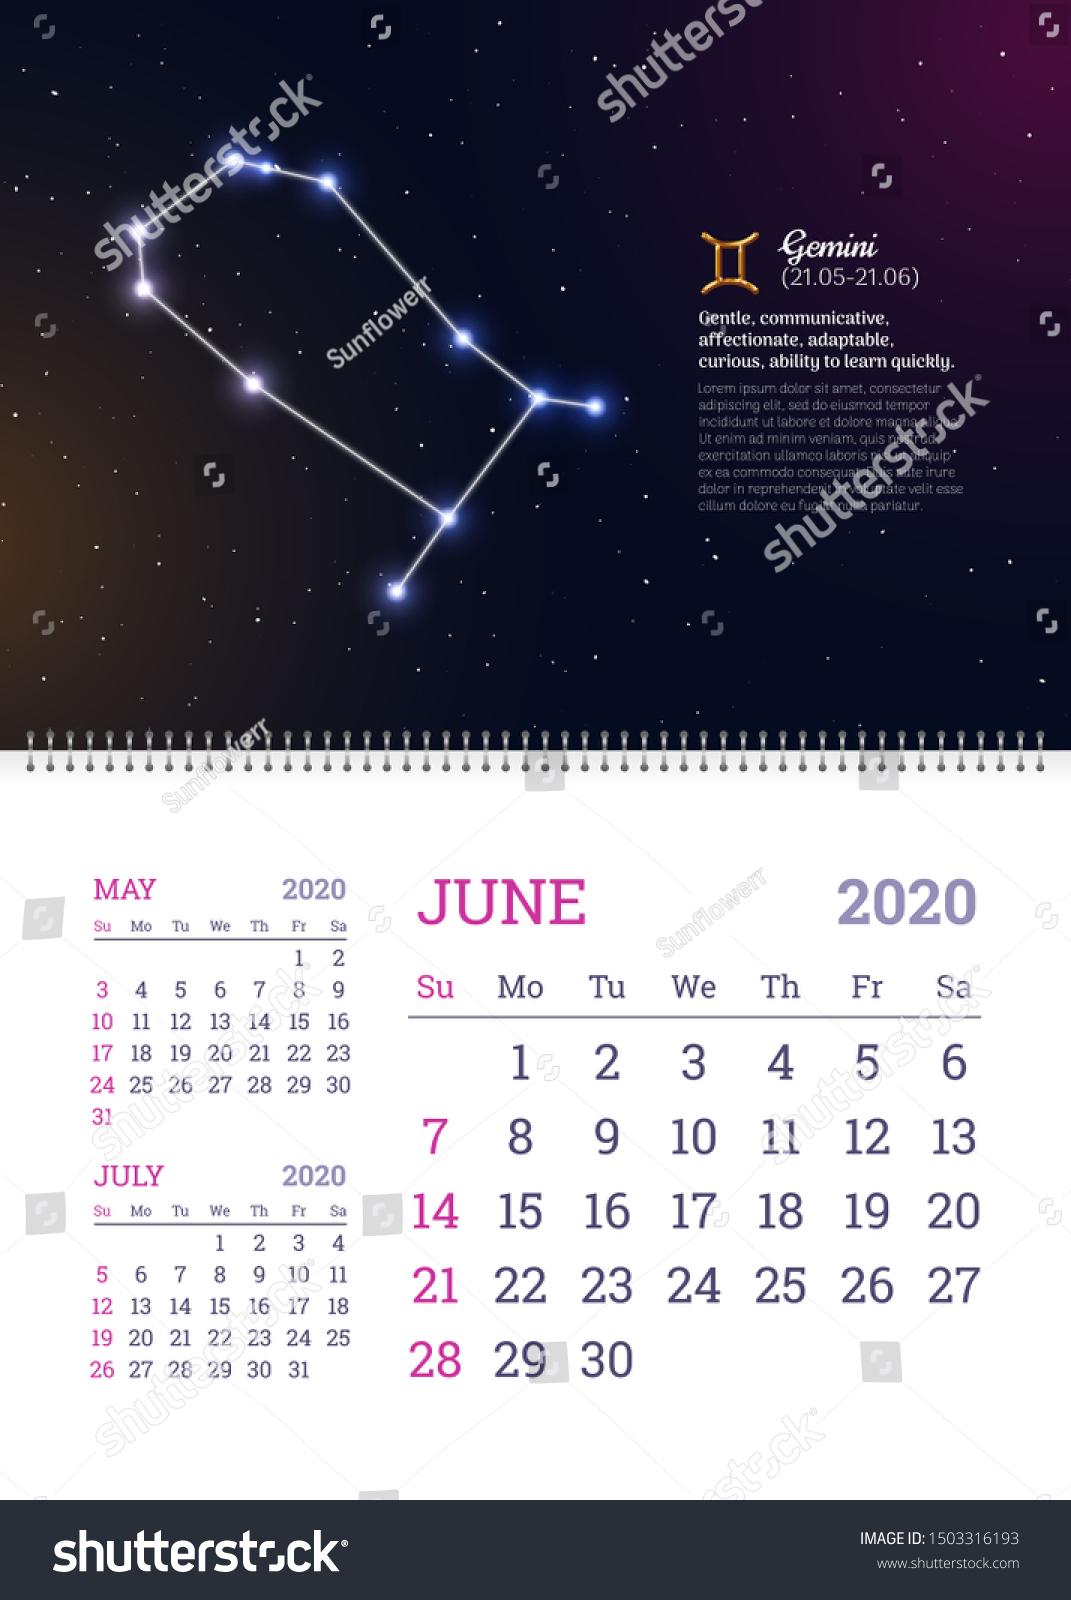 Стоковая Векторная Графика «Wall Calendar June 2020 Year